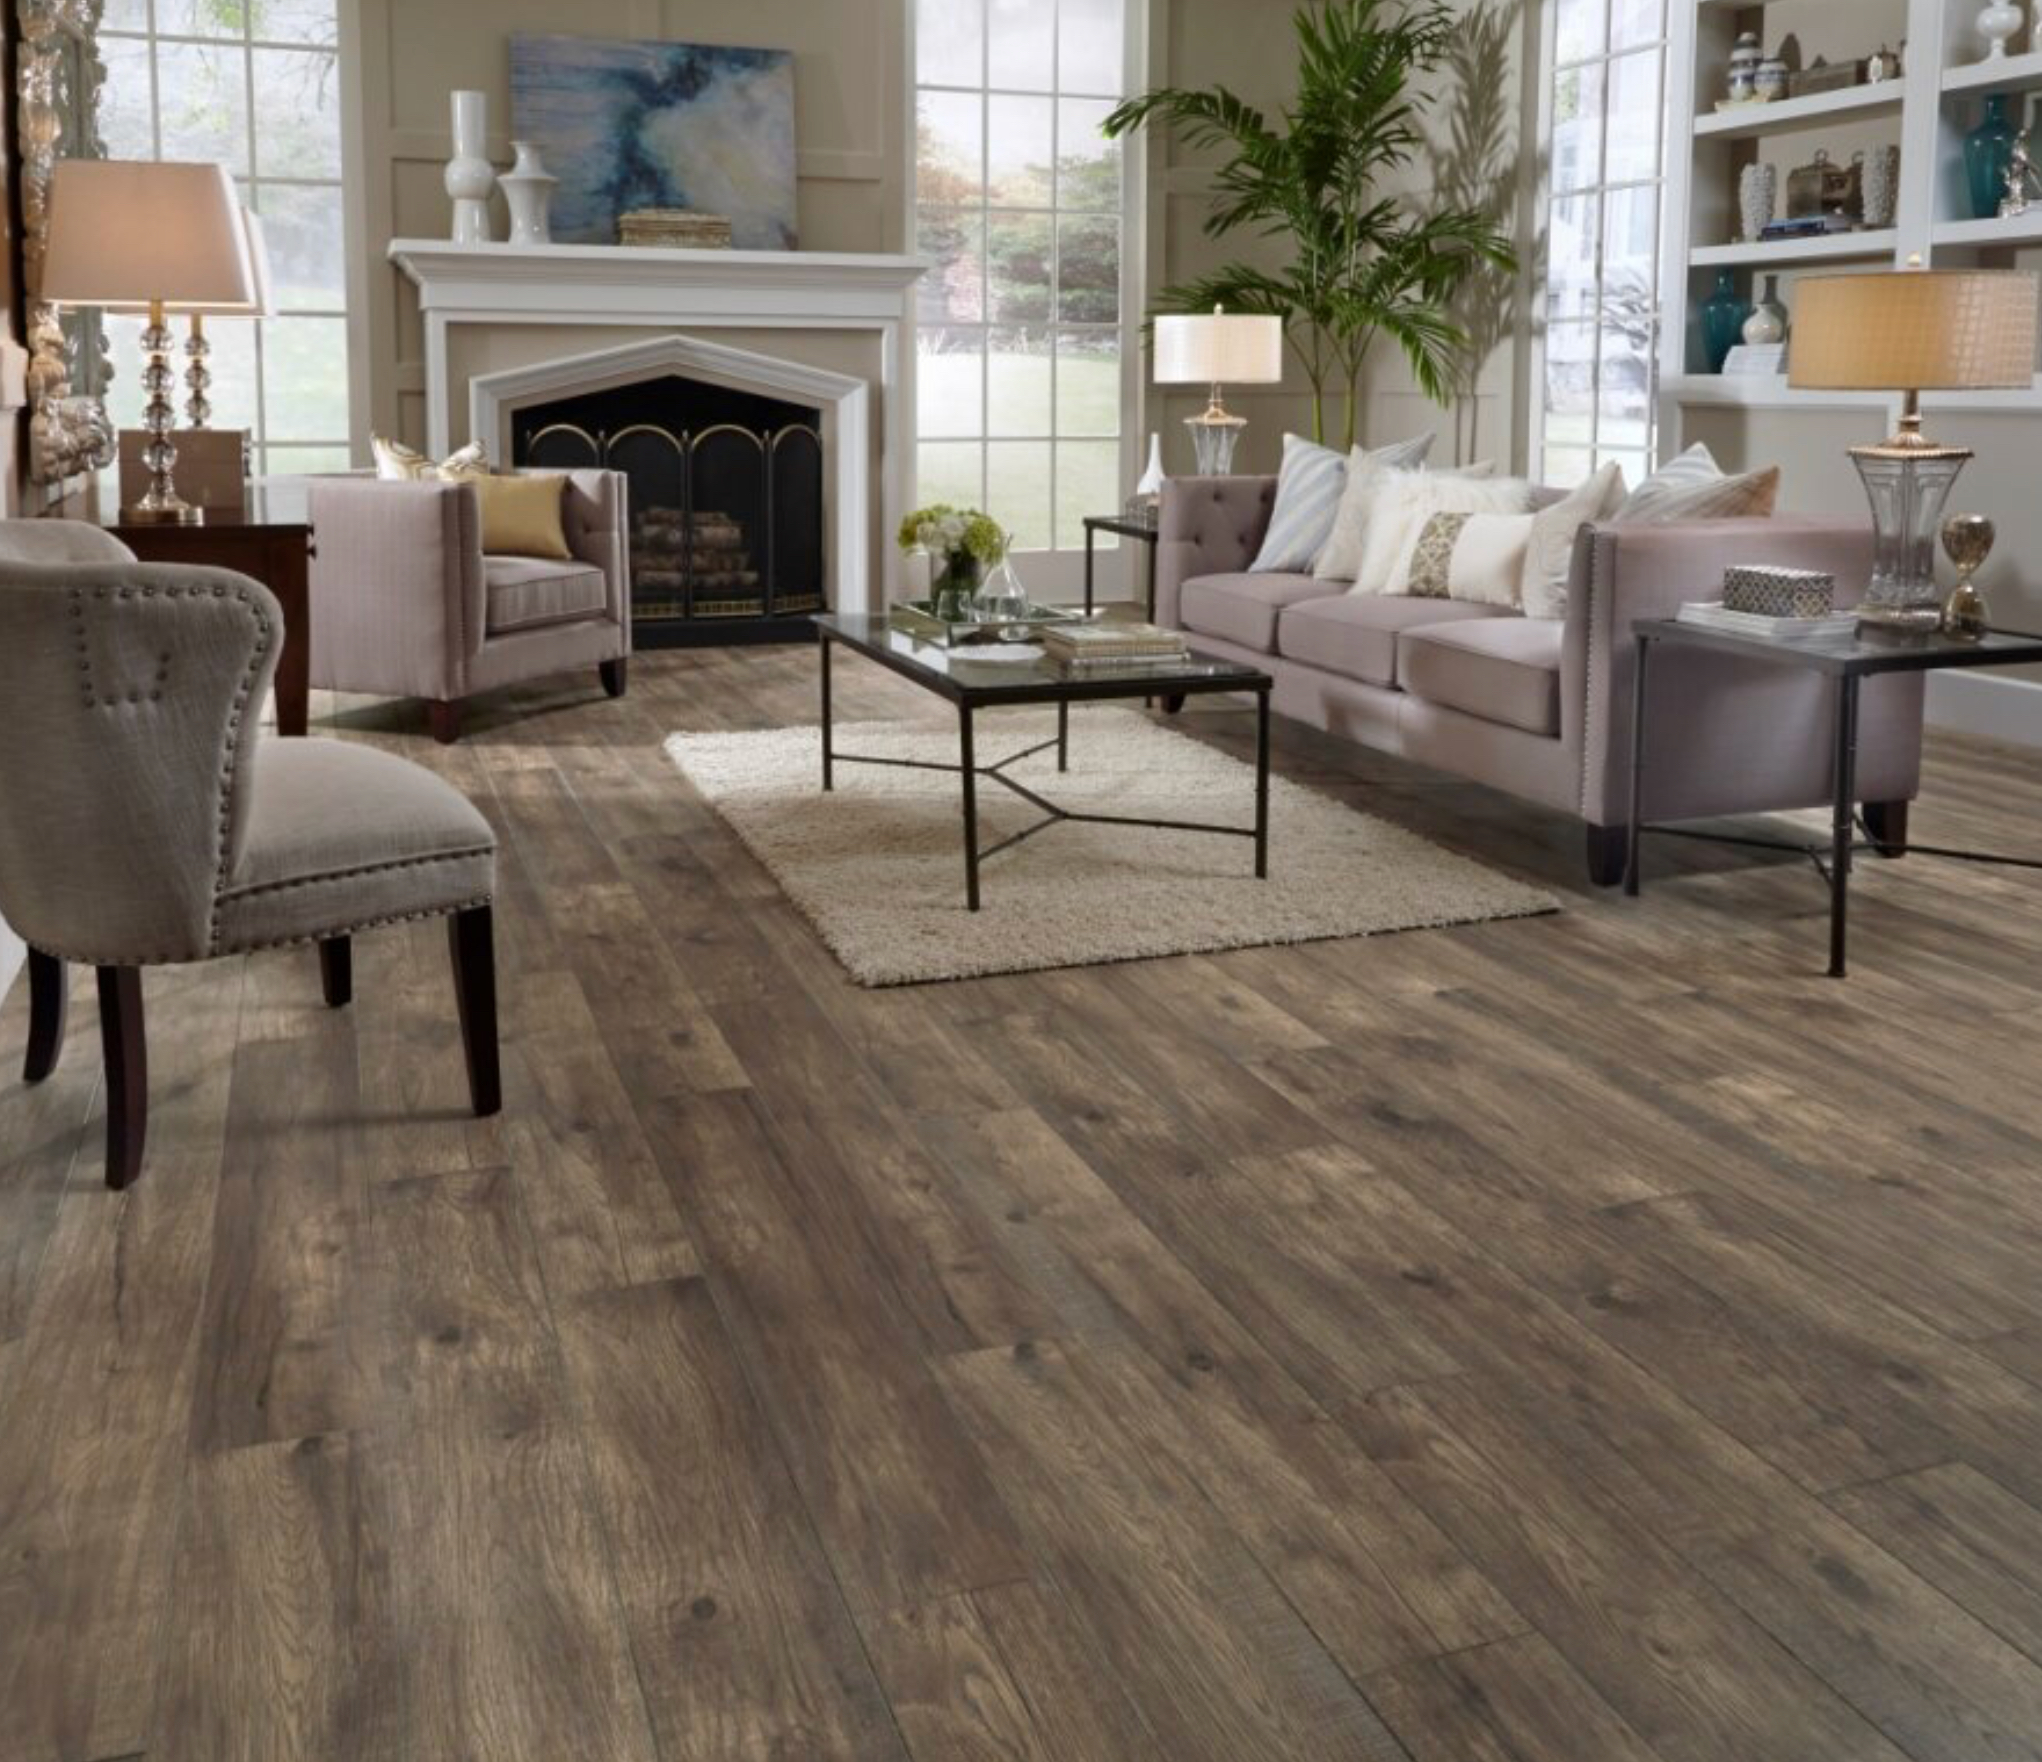 homewise-innovations-wood-flooring-3